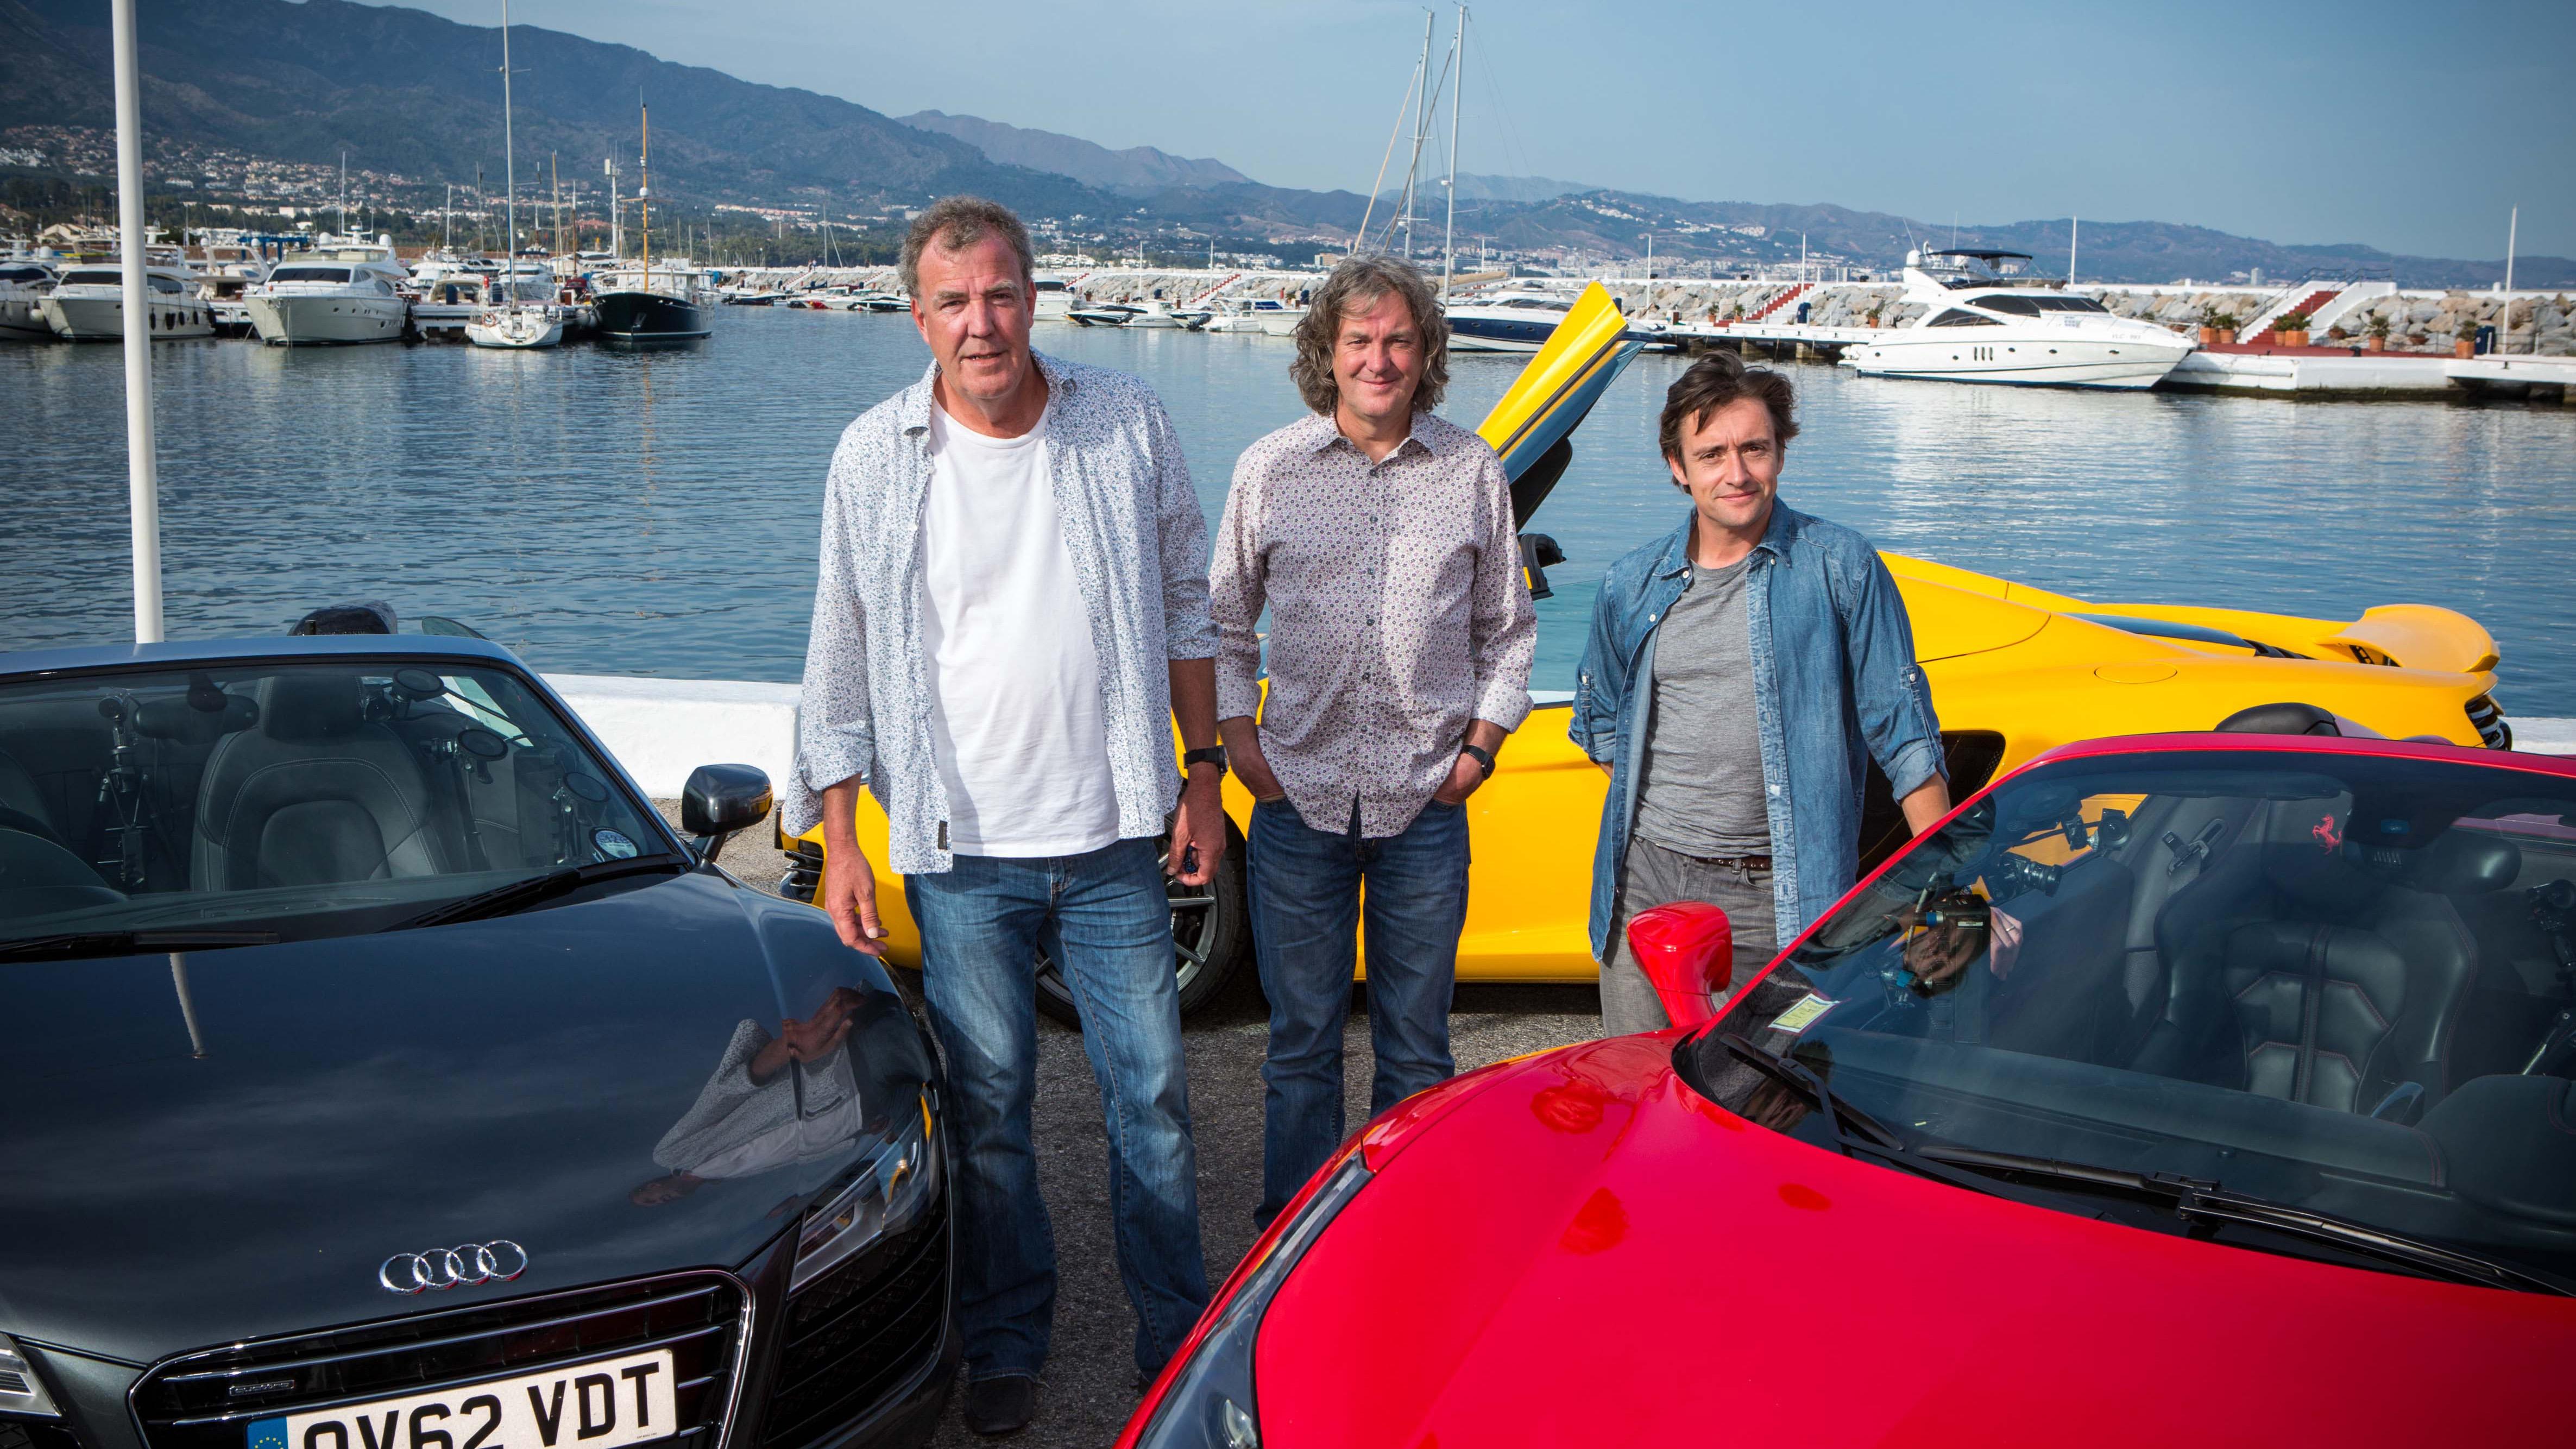 Series 20 Episode 3 Top Gear